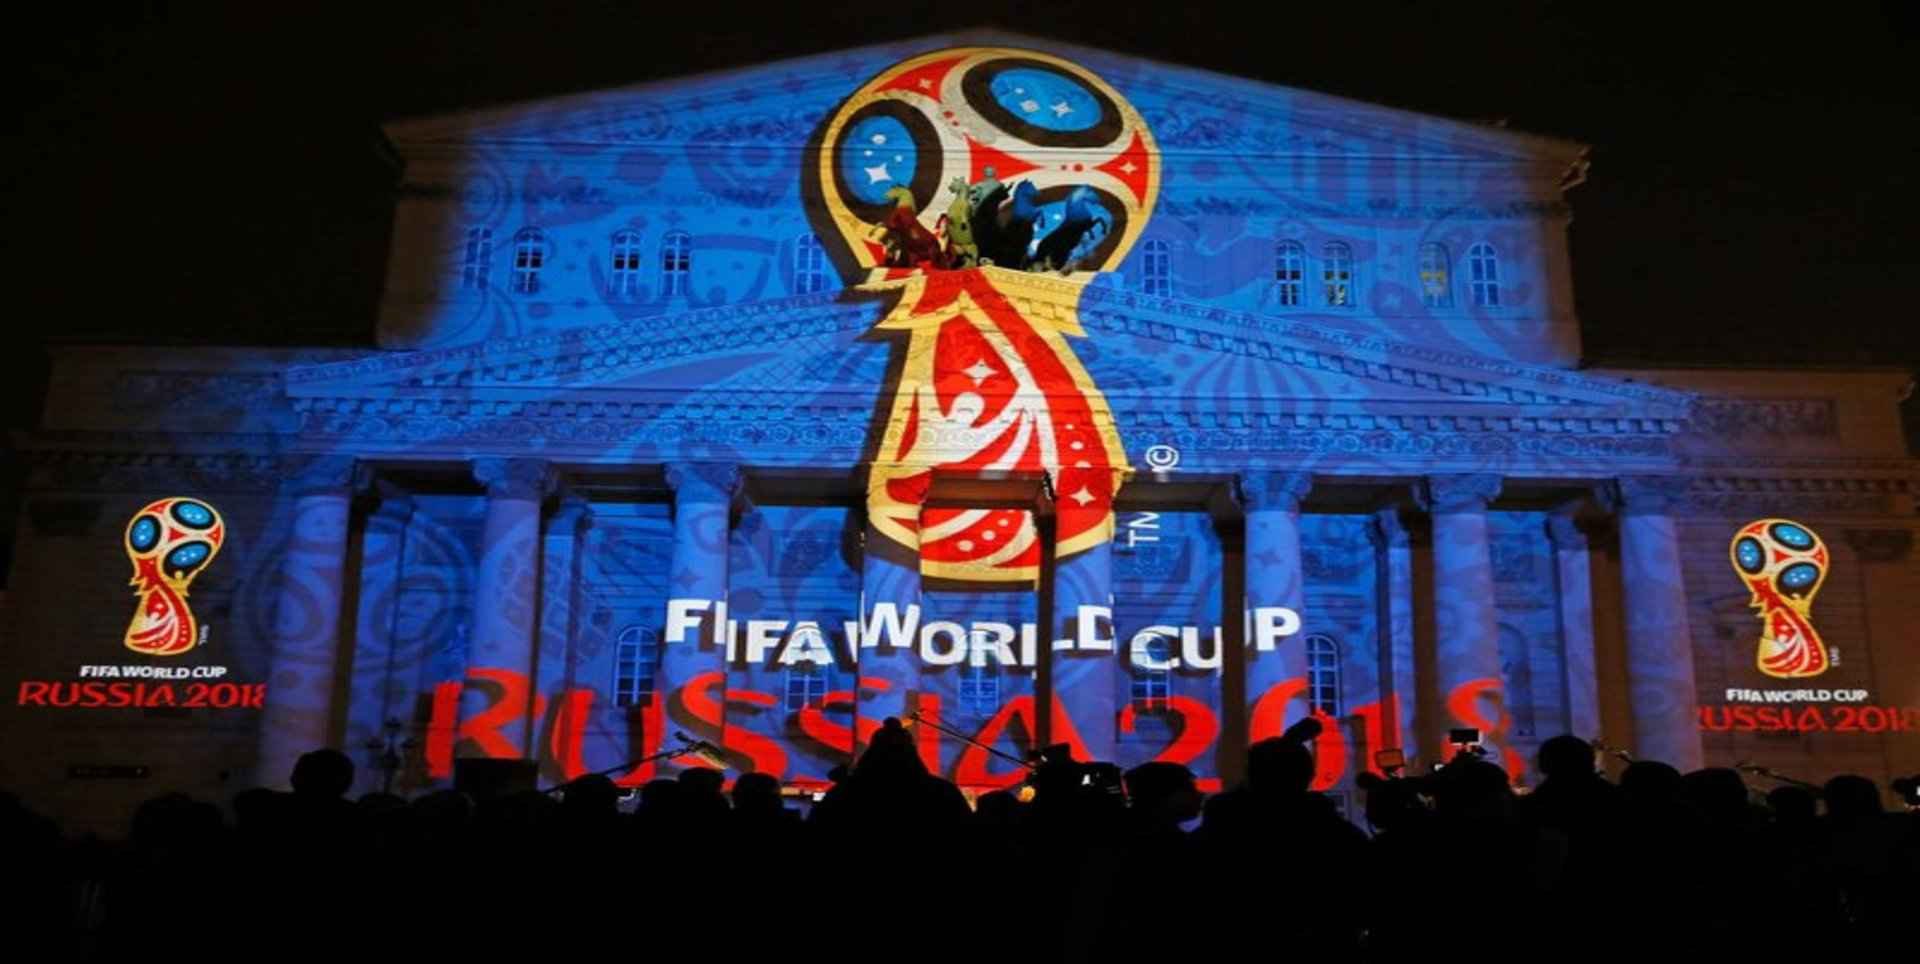 2018-fifa-uefa-group-b-portugal-vs-hungary-hd